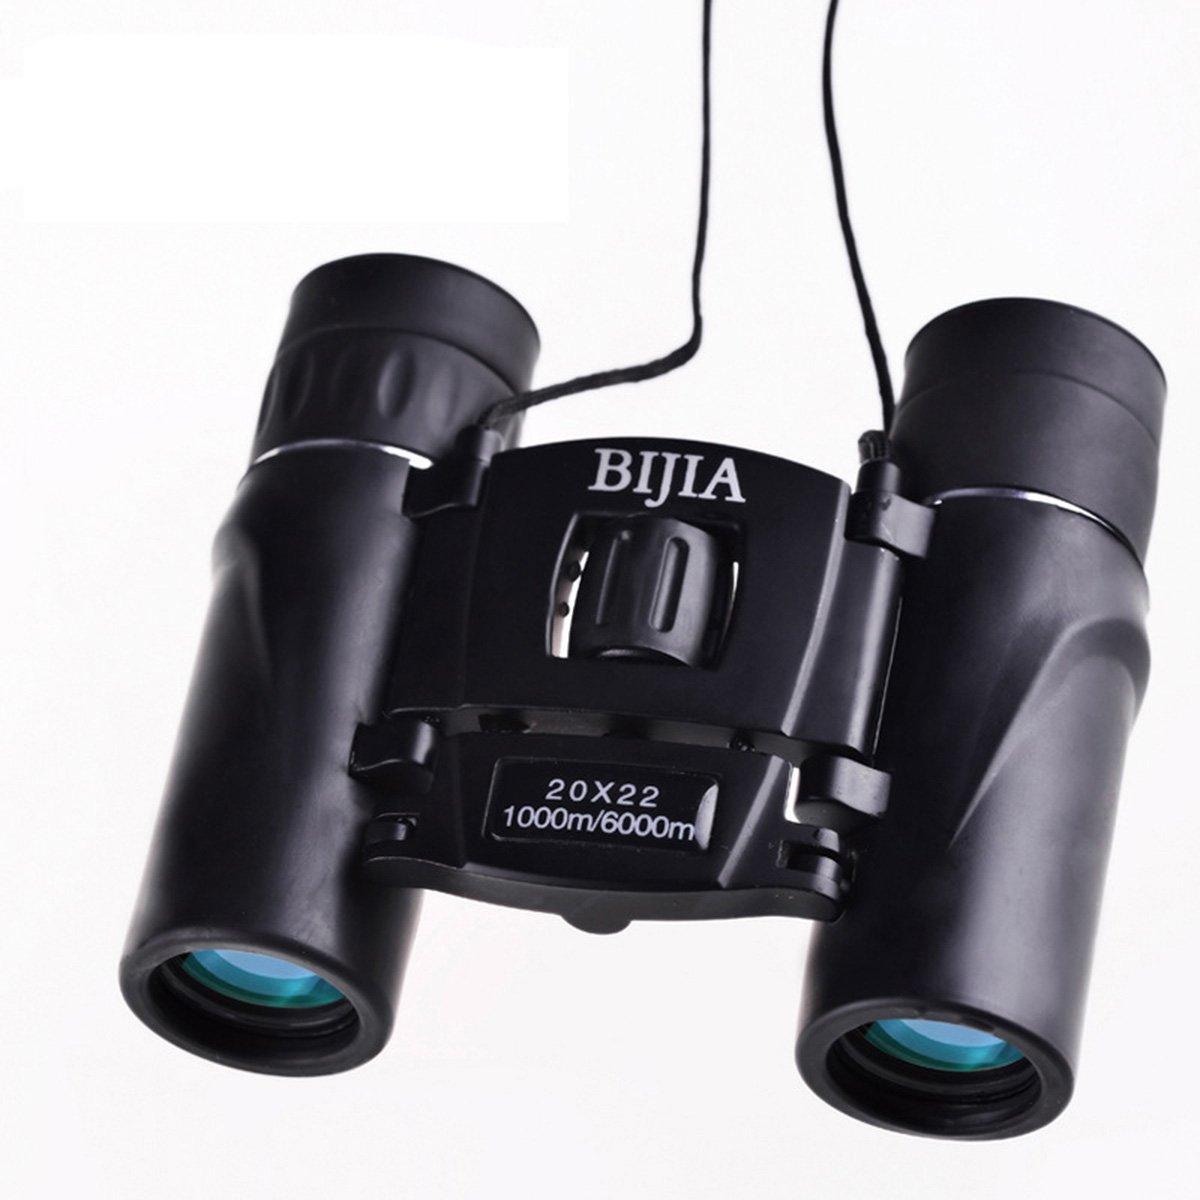 20 x 22 non-infrared高電力高品位ポケット双眼鏡 – ブラック B077K35SJS